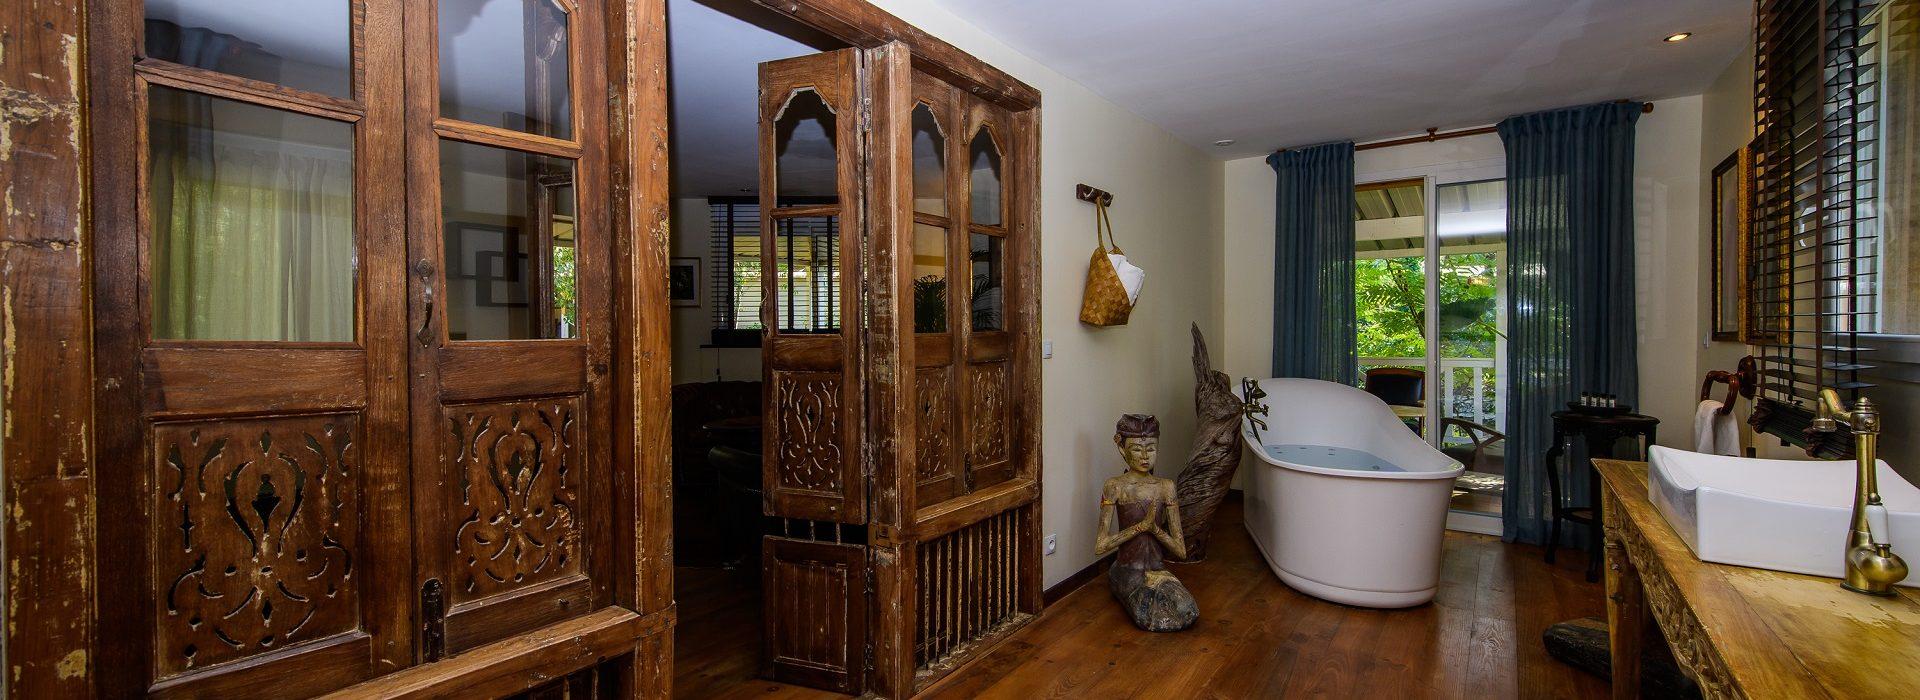 Chambre dhote exotique bali